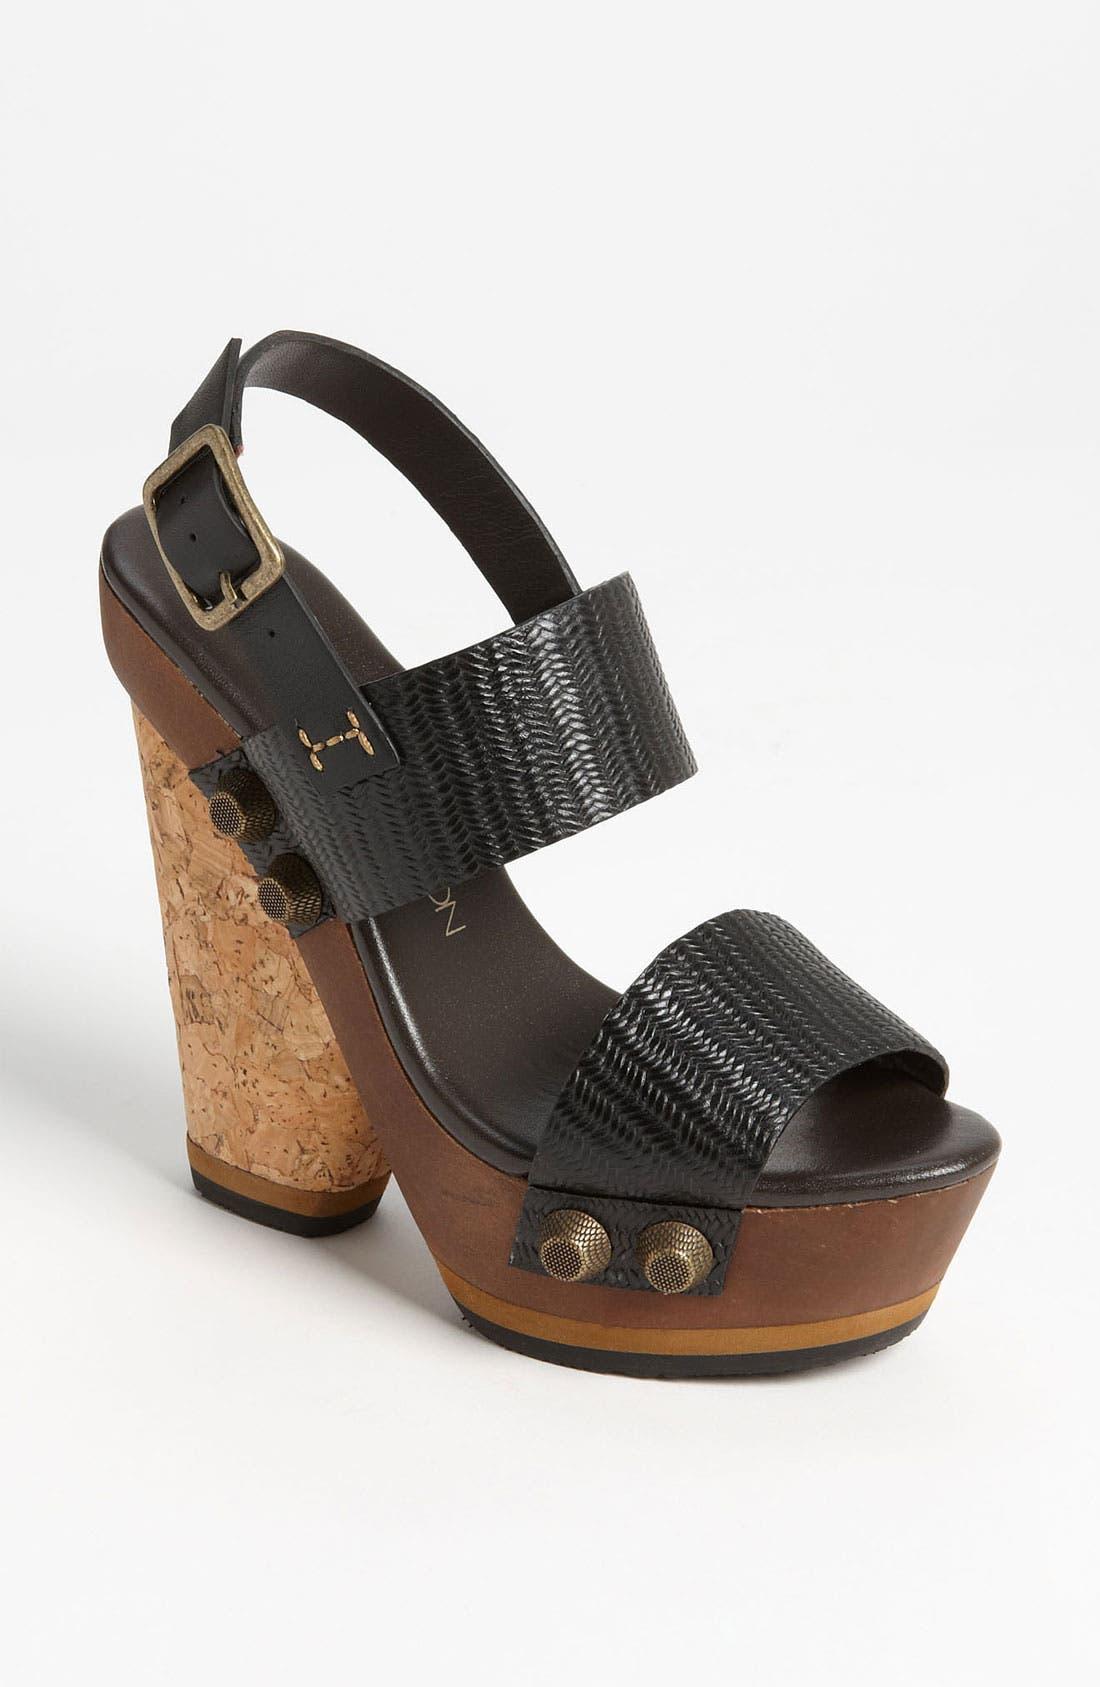 Alternate Image 1 Selected - Blonde Ambition 'Nubia' Sandal